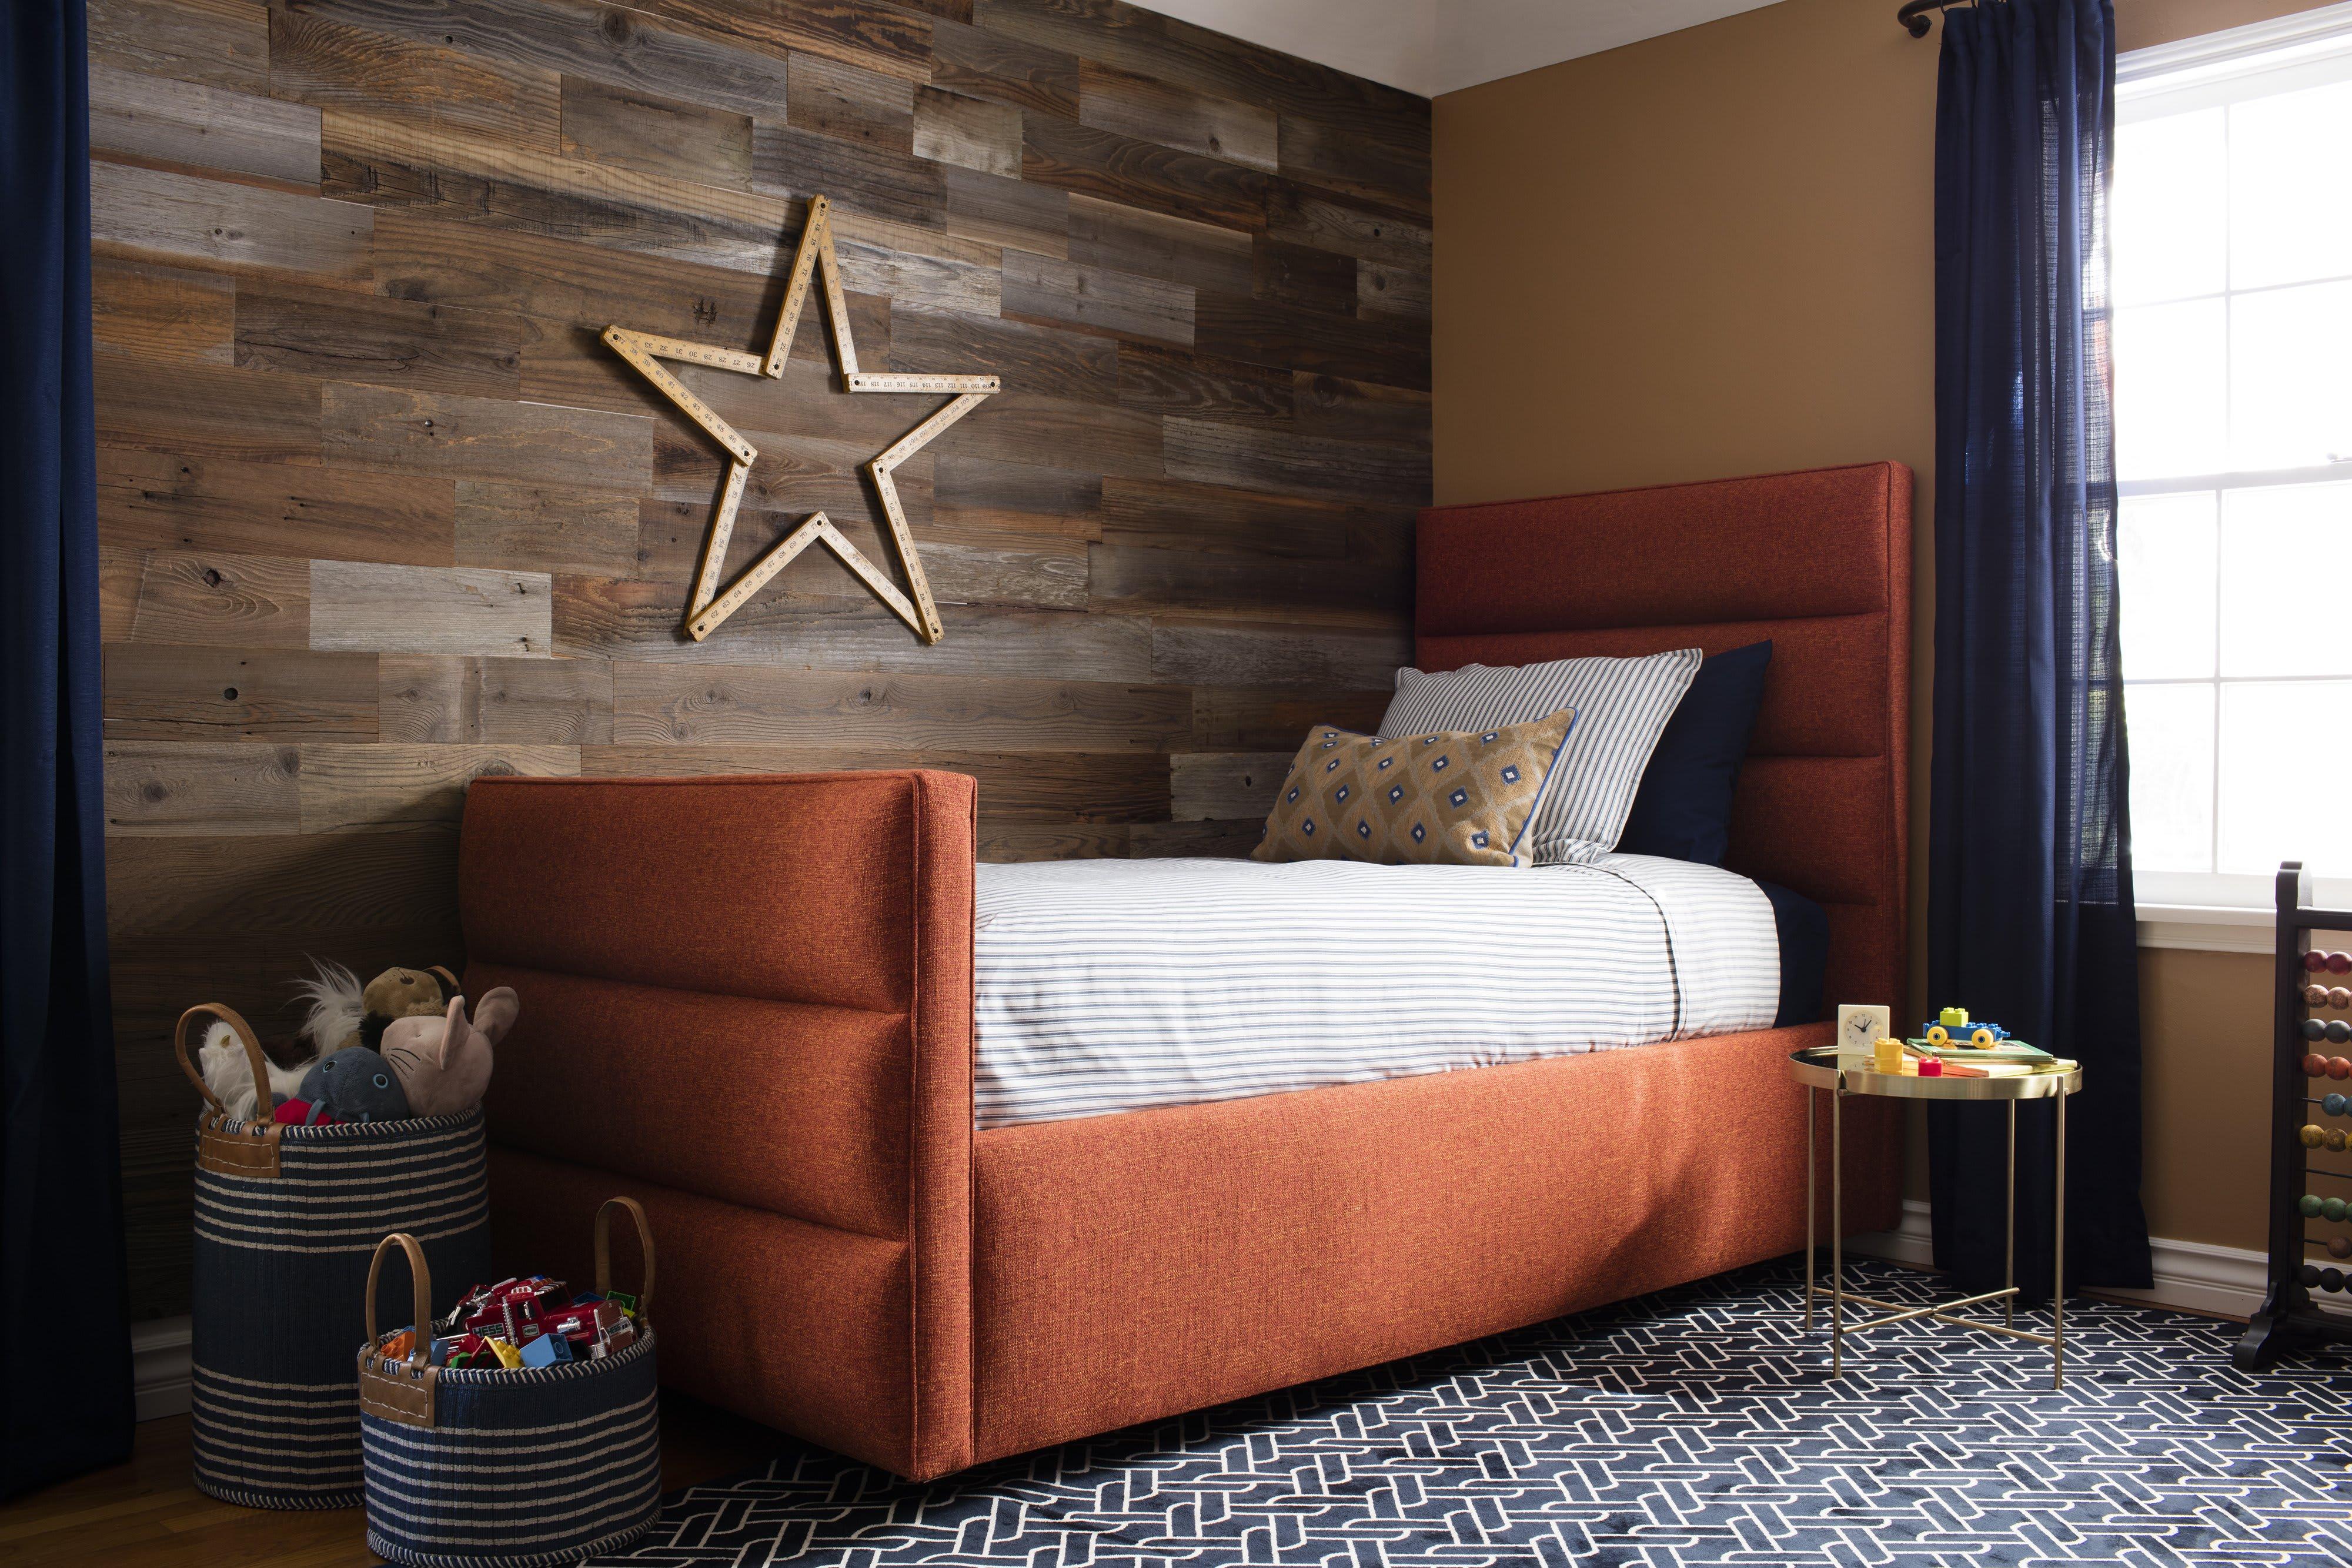 Reclaimed Sierra Silver peel and stick wood wall